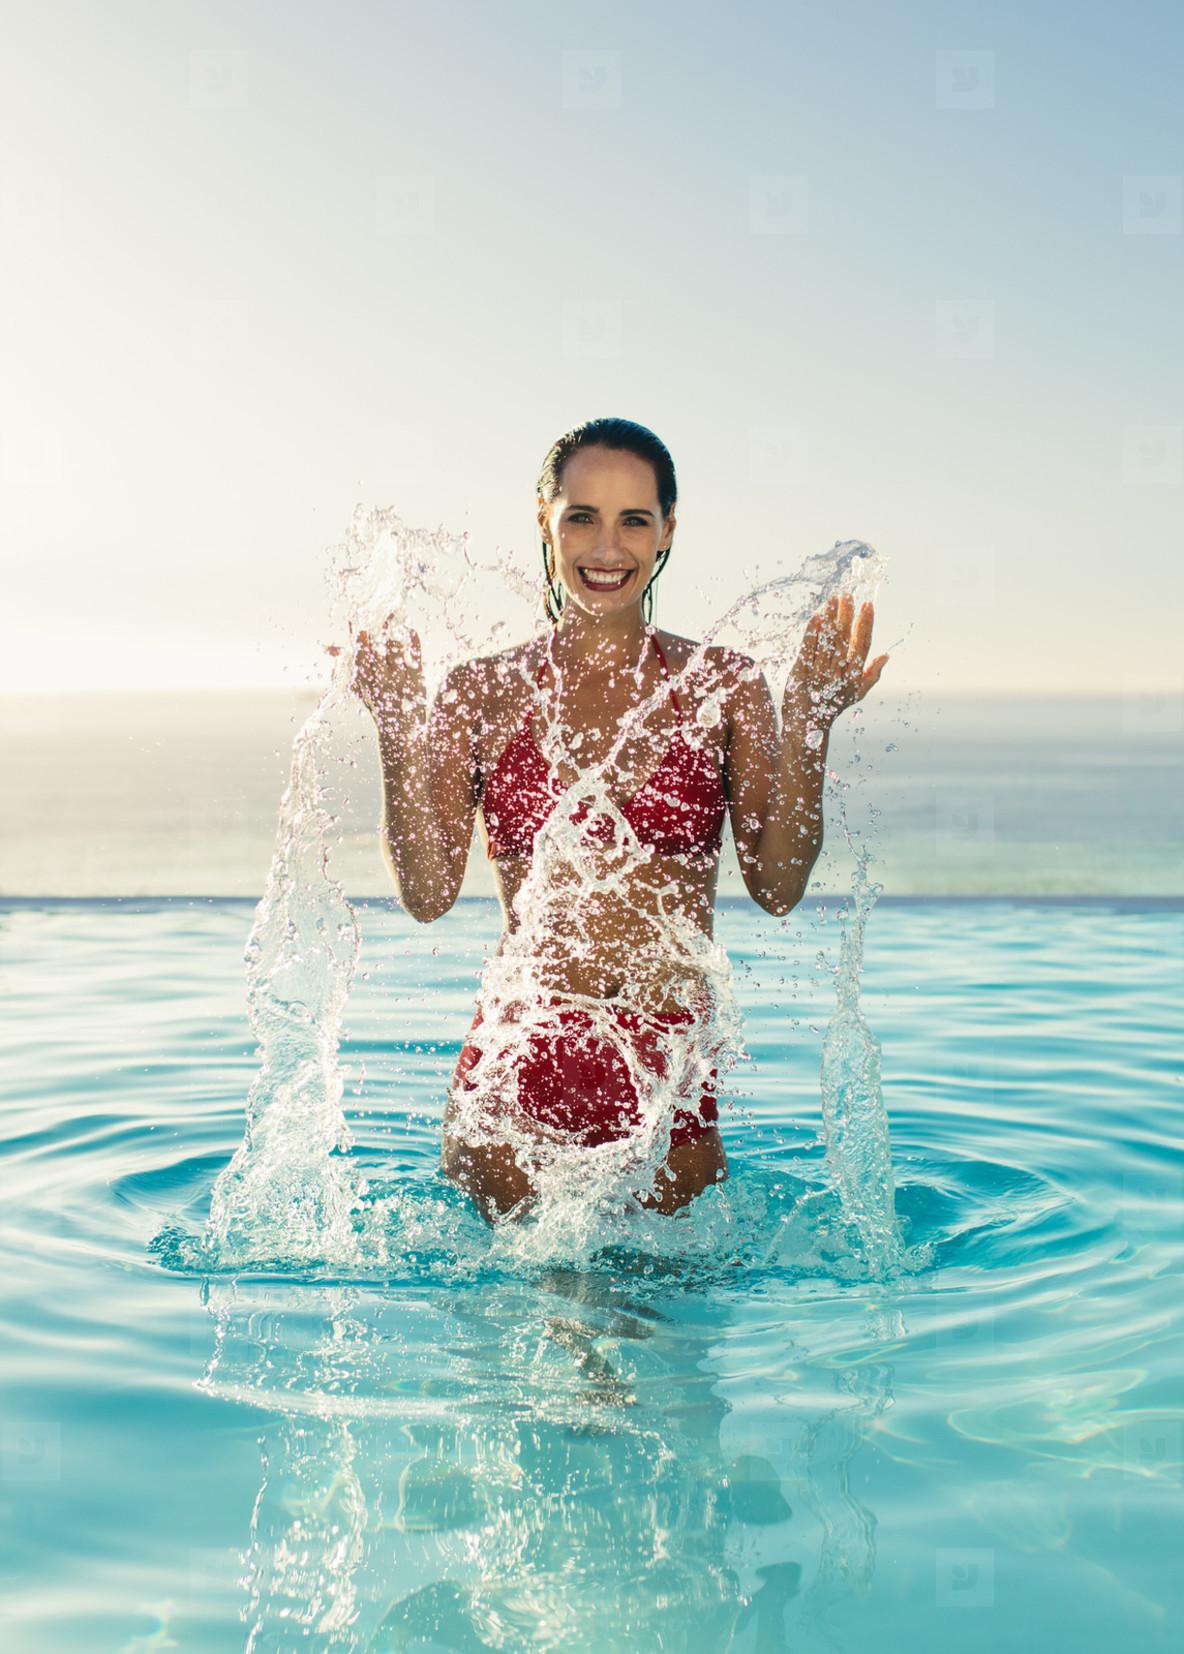 ad88fe87d51 Photos - Woman having fun in infinity pool - YouWorkForThem